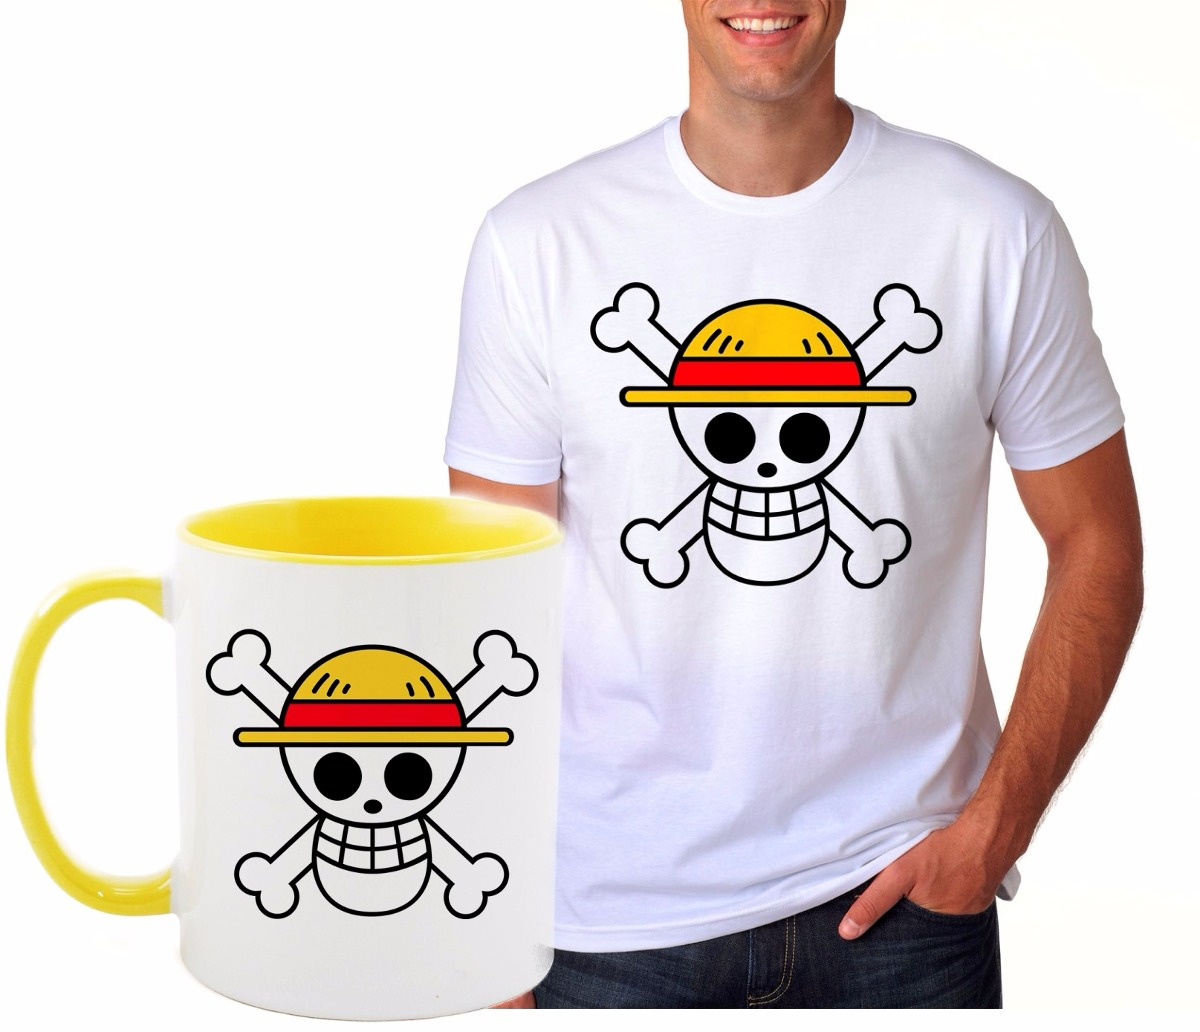 kit caneca e camiseta one piece monkey d. luffy chapéu palha. Carregando  zoom. 1cbf81c2816